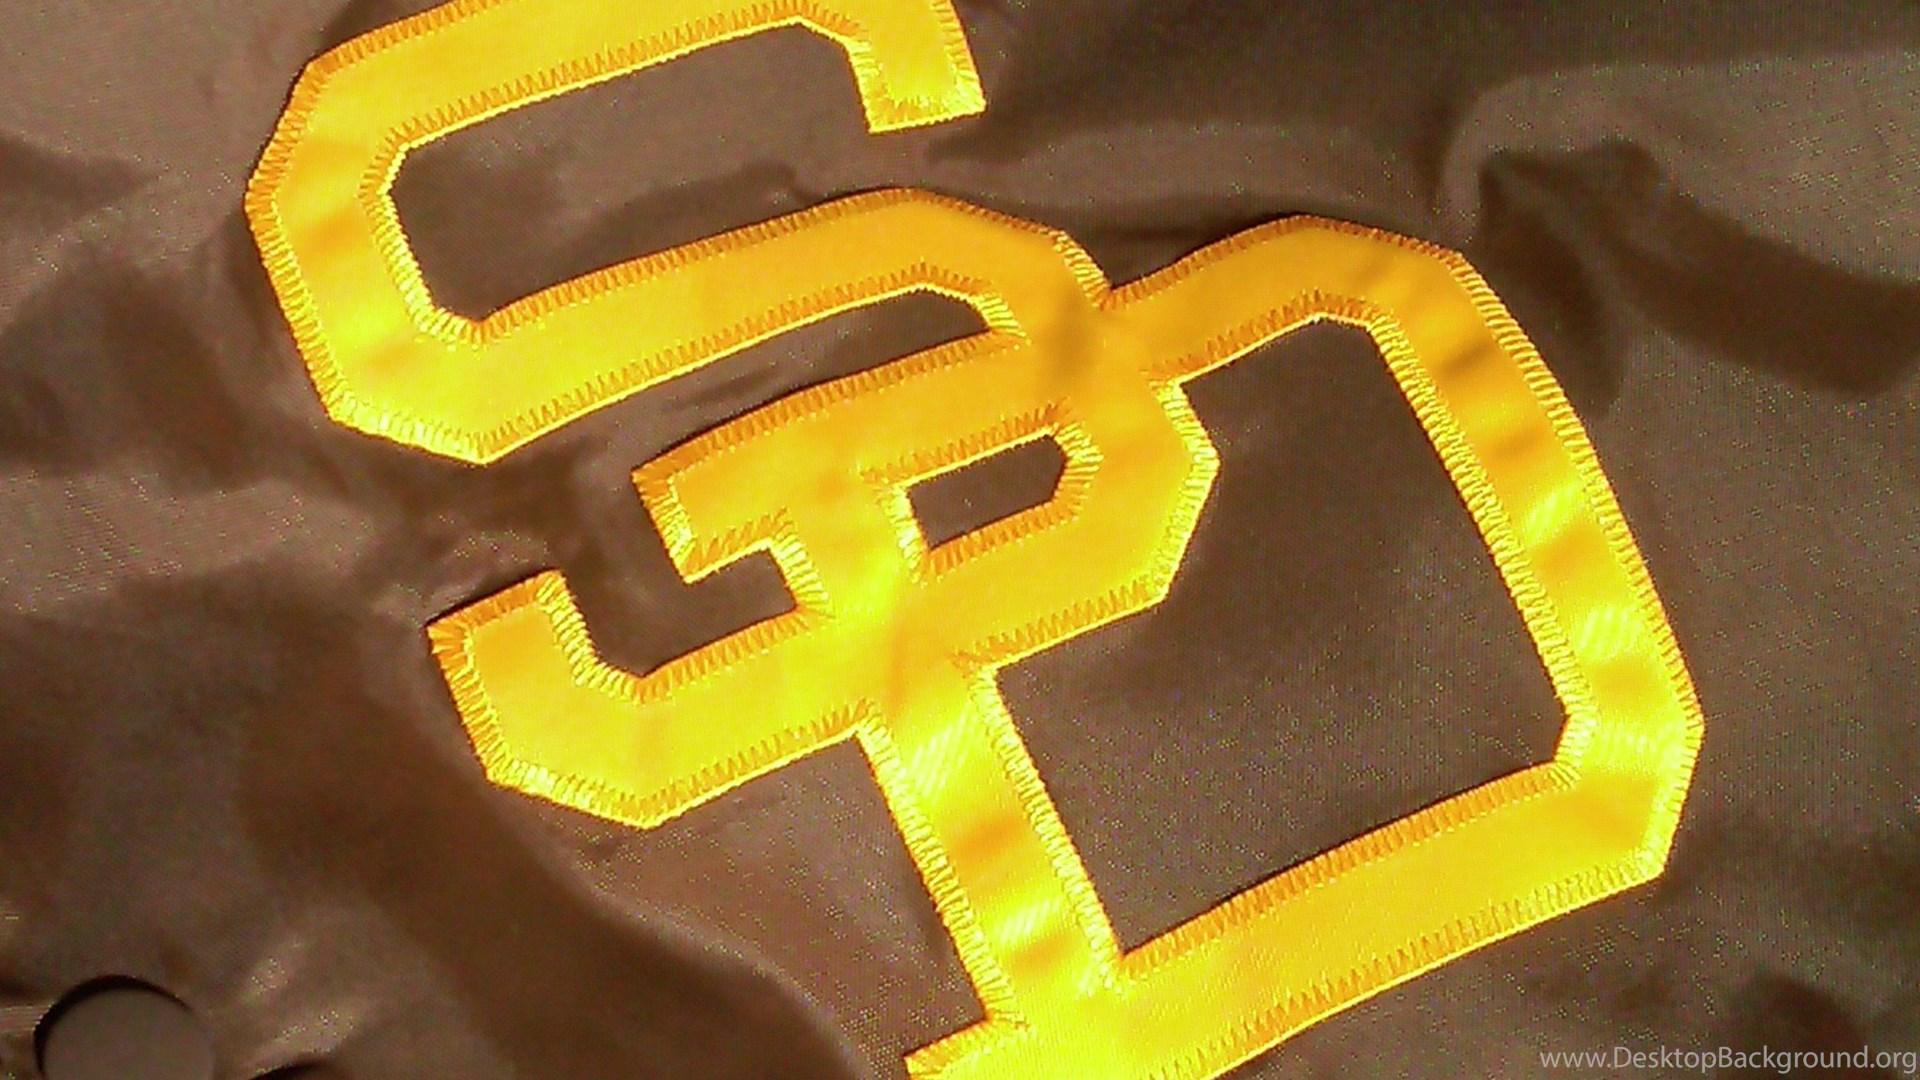 San Diego Padres Mlb Baseball 34 Wallpapers Desktop Background